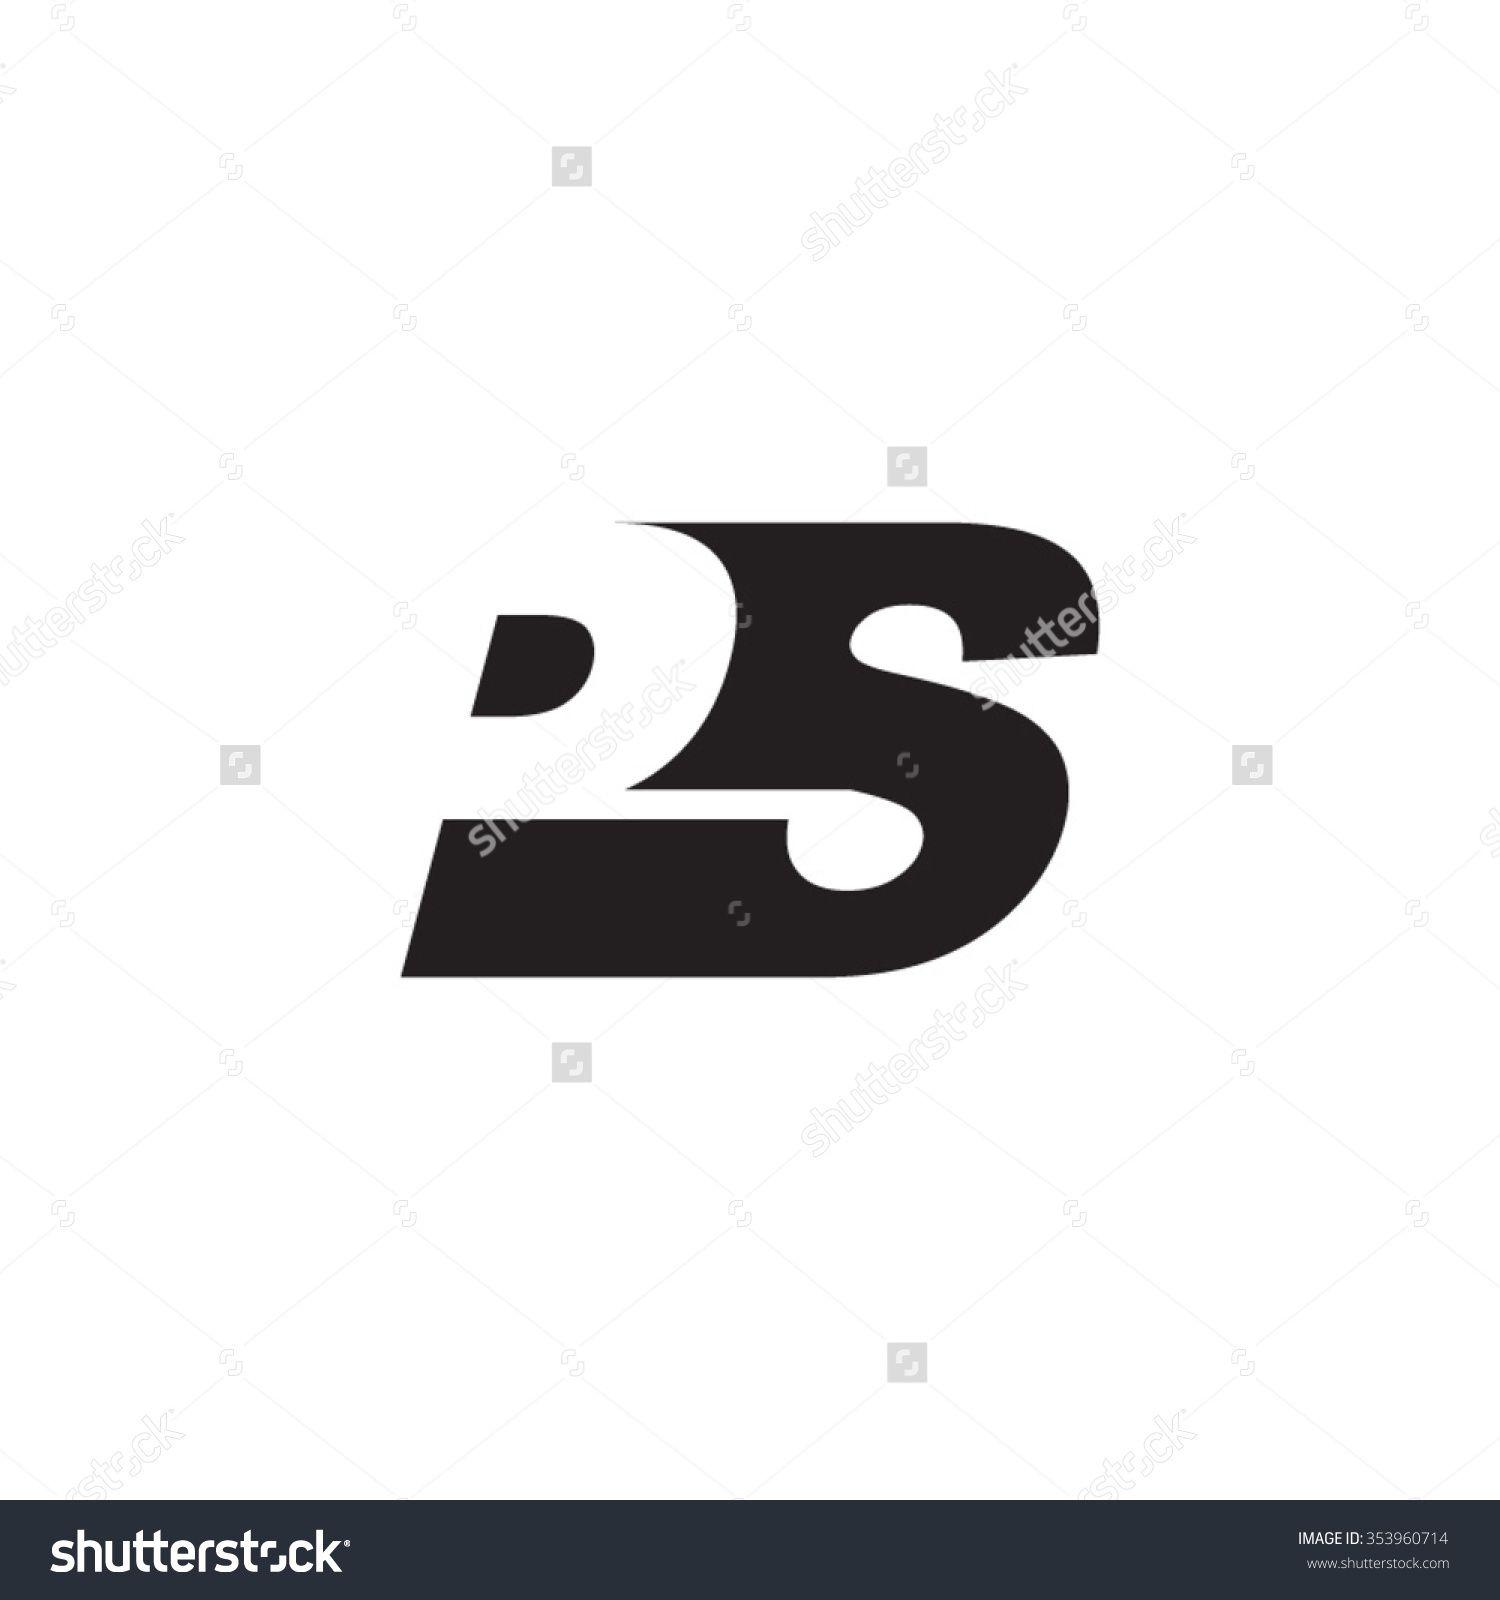 Imageutterstock z stock vector ps negative space letter imageutterstock z stock vector ps negative space buycottarizona